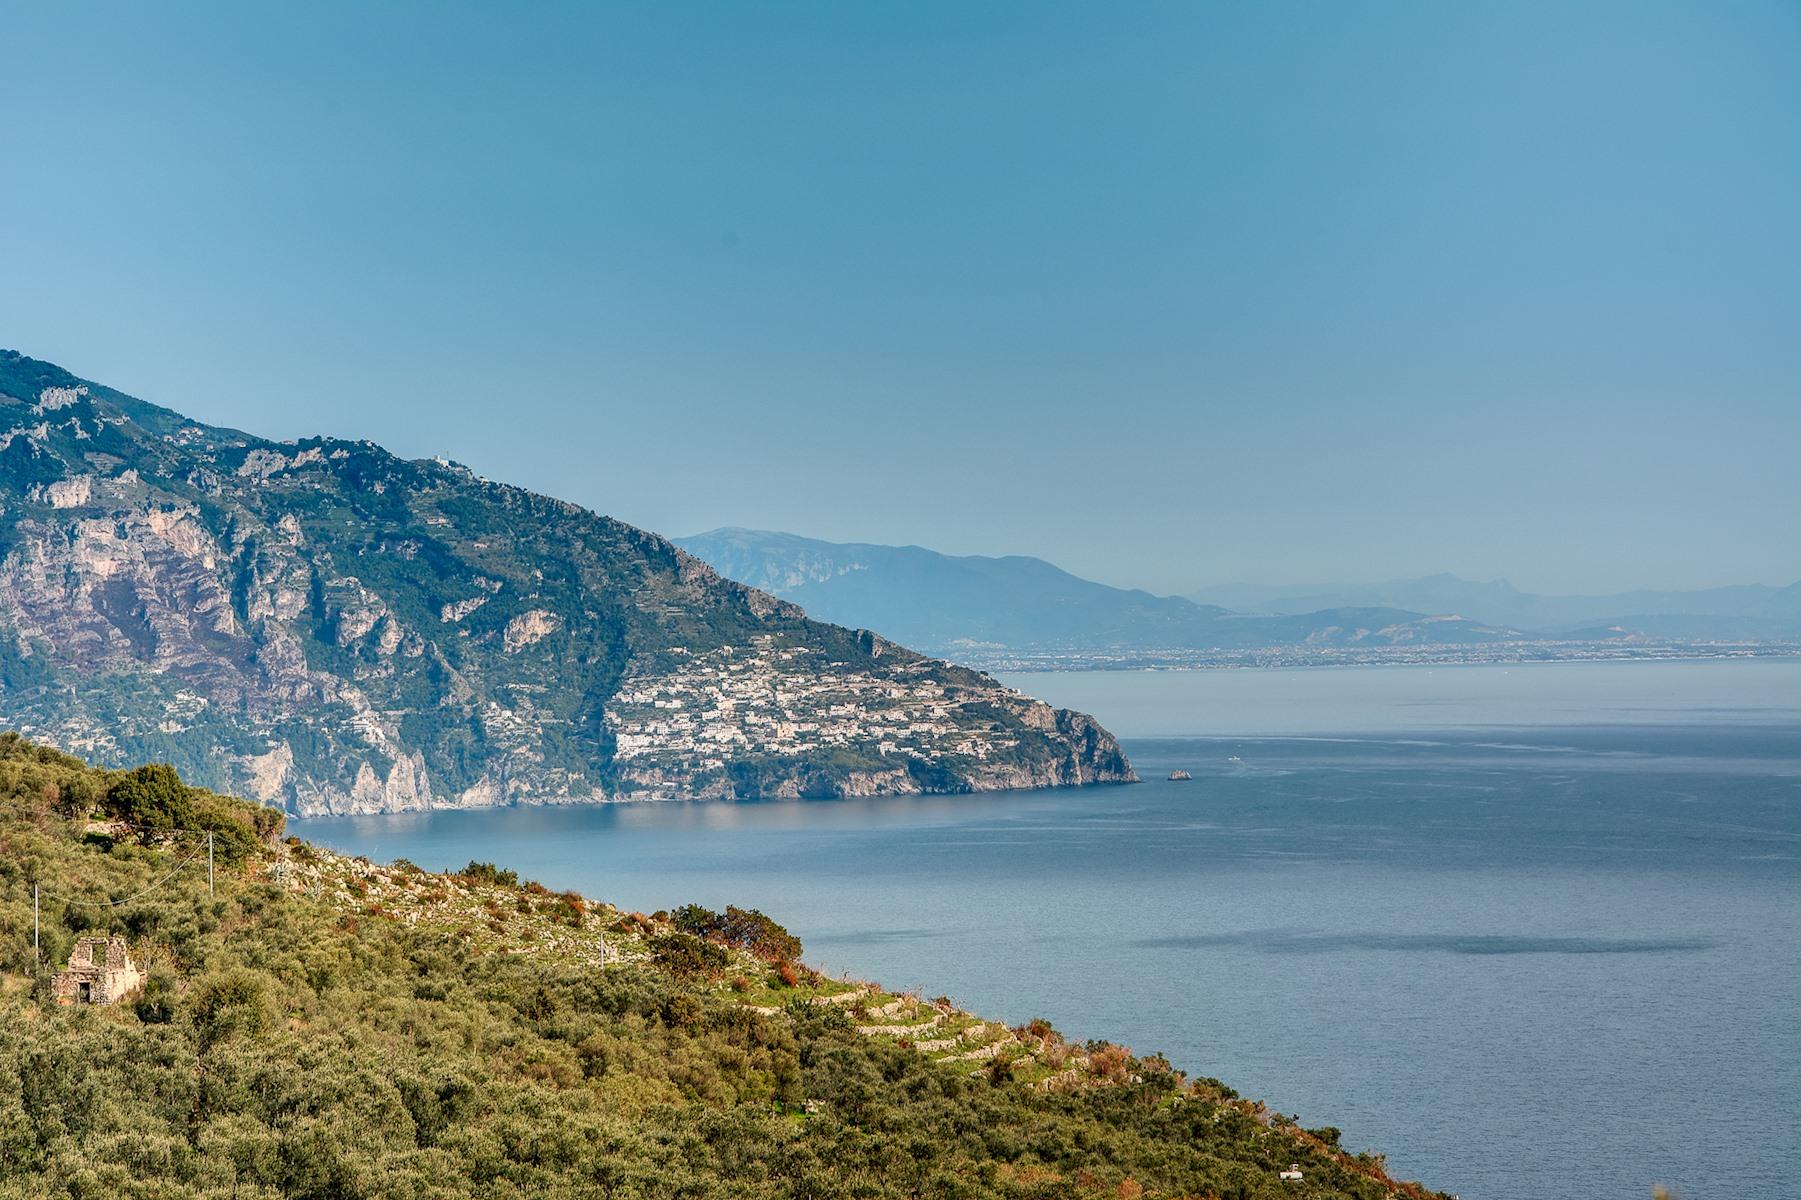 Apartment Casa Elisa - Spectaular Views to the Amalfi Coast photo 20429019